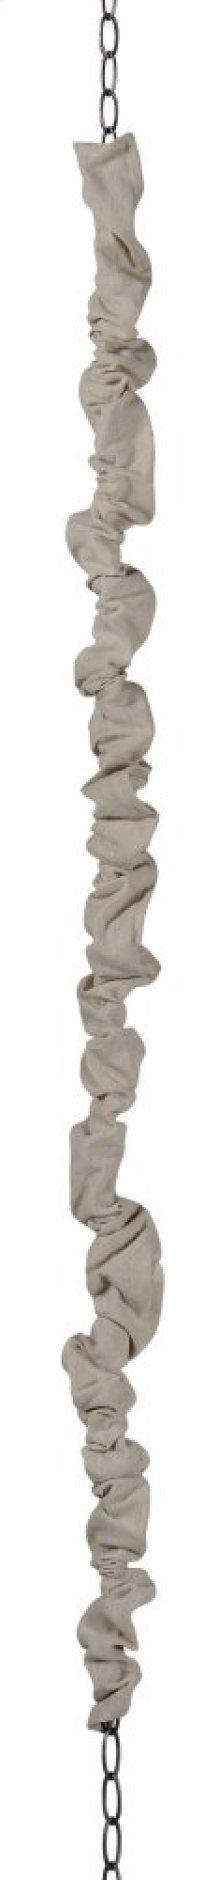 Oatmeal Linen Cord Cover